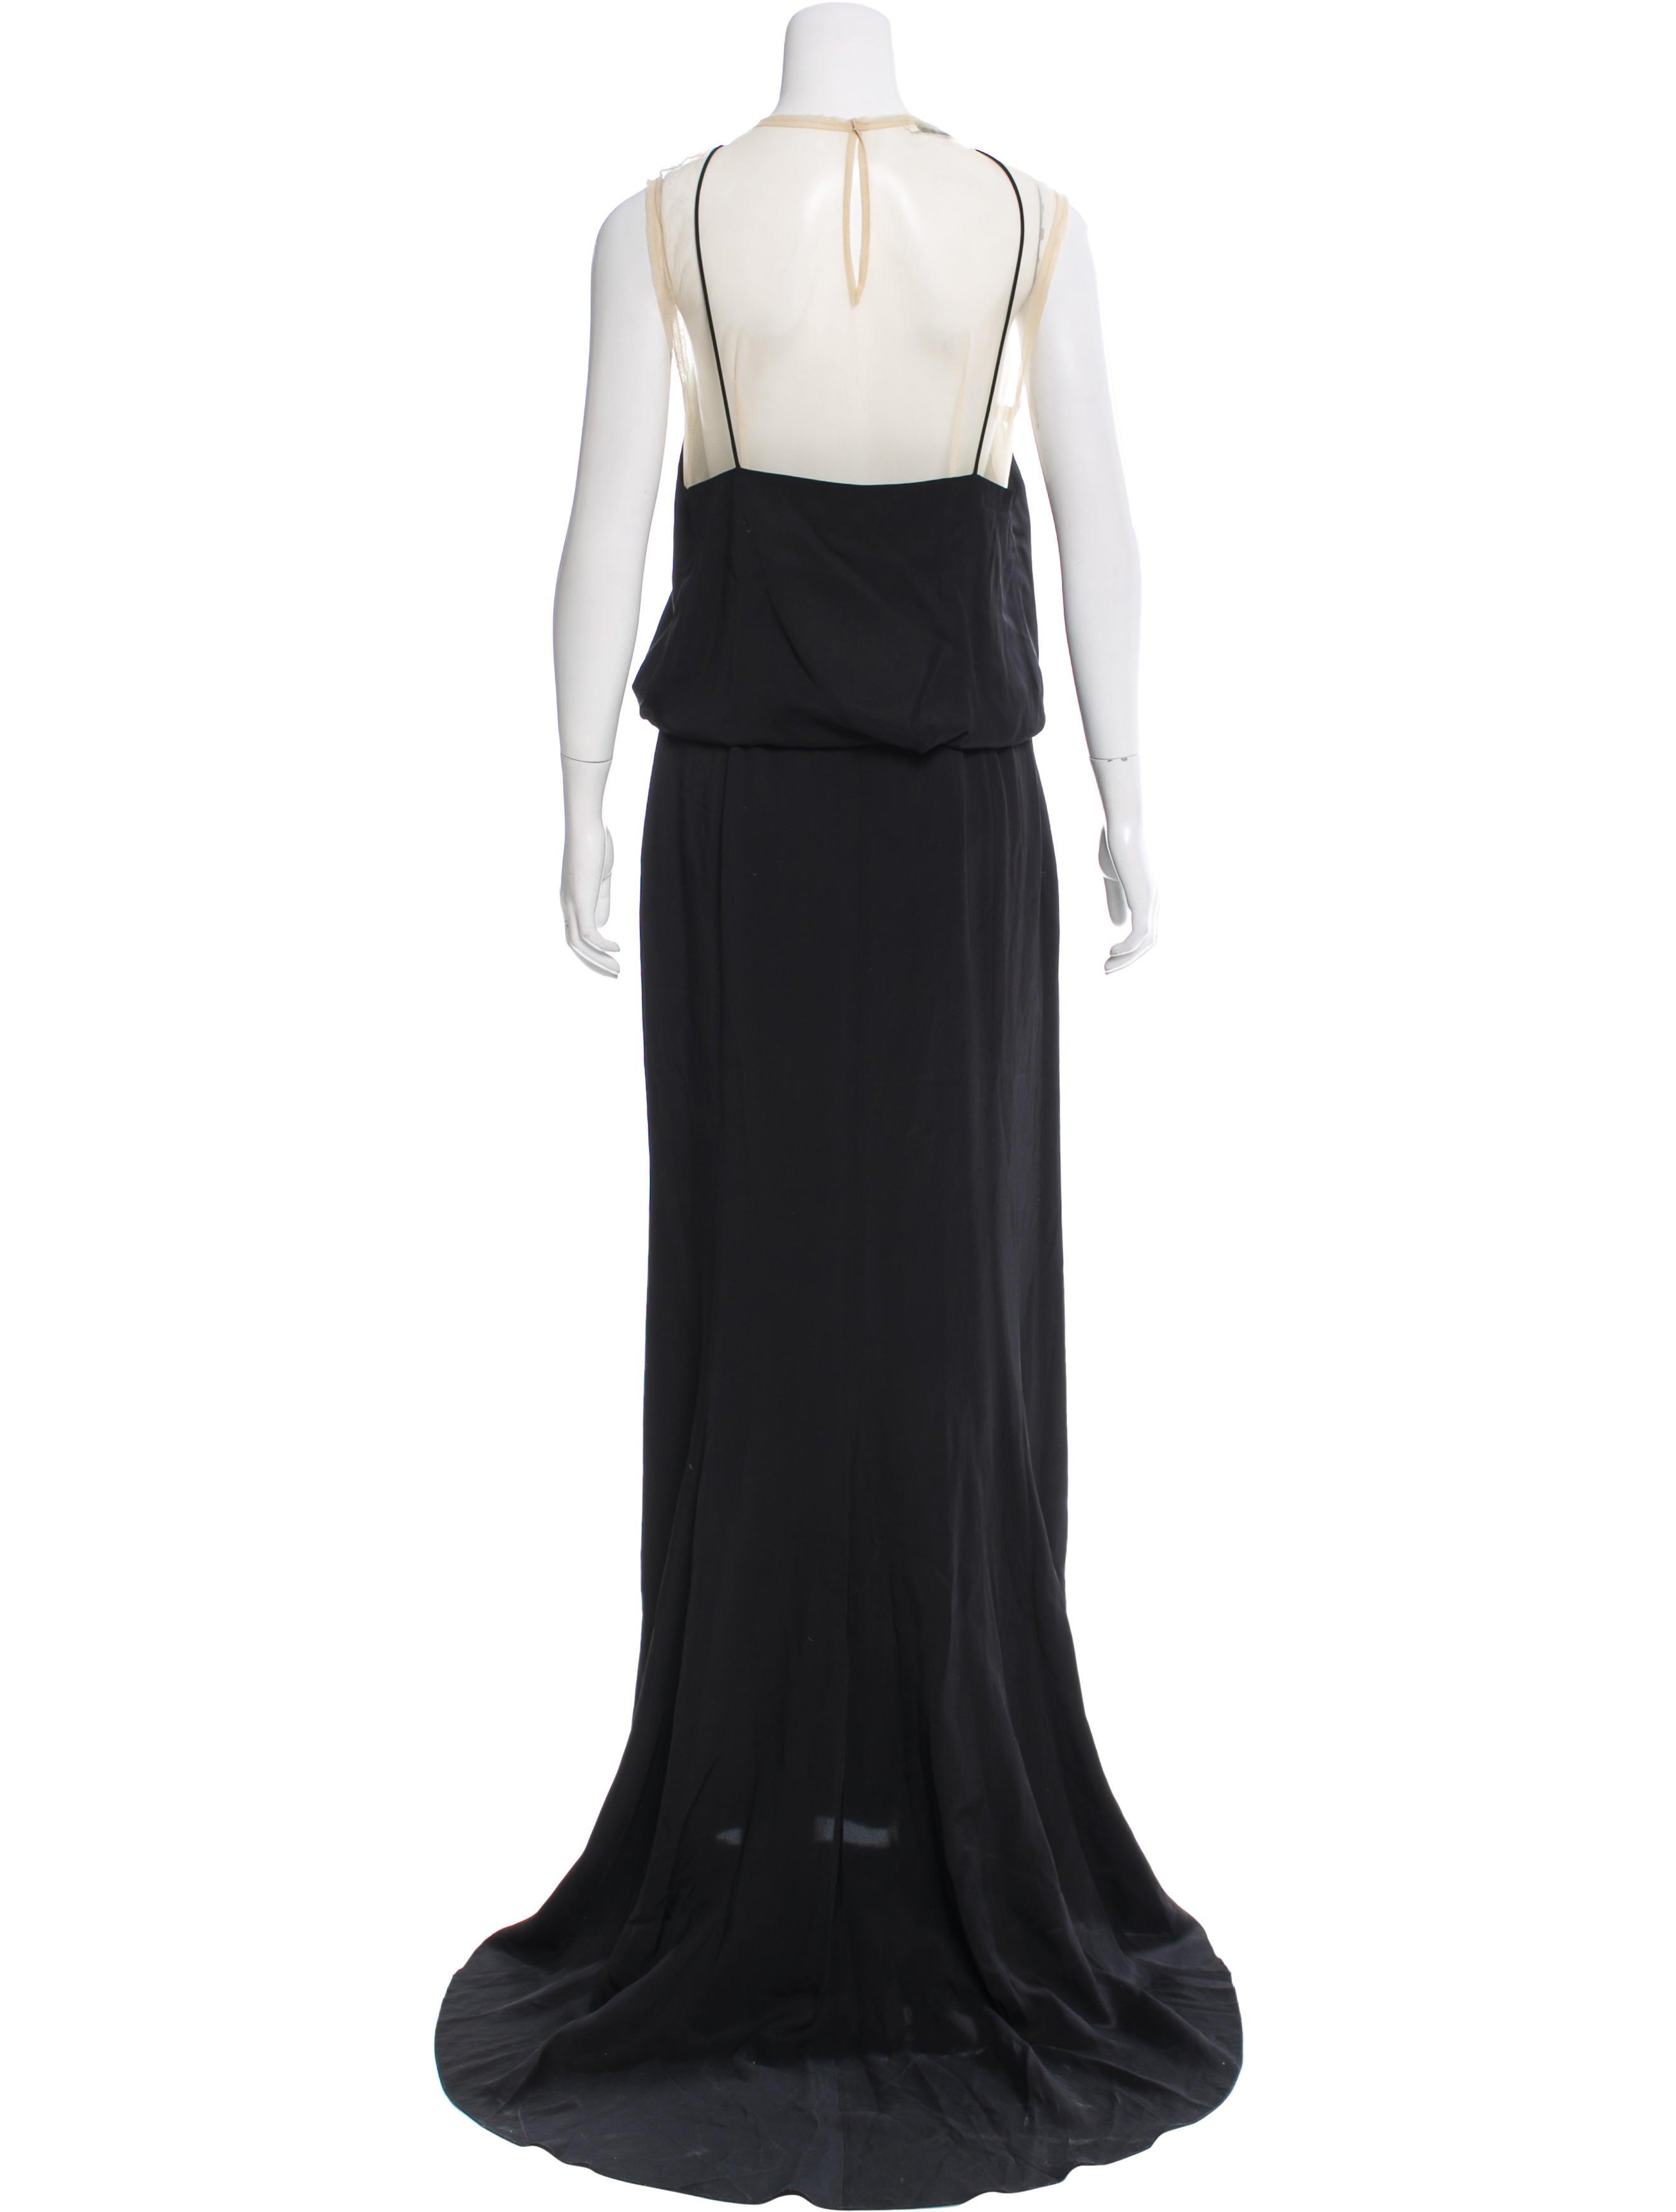 dries van noten darwin maxi dress clothing dri39473 the realreal. Black Bedroom Furniture Sets. Home Design Ideas